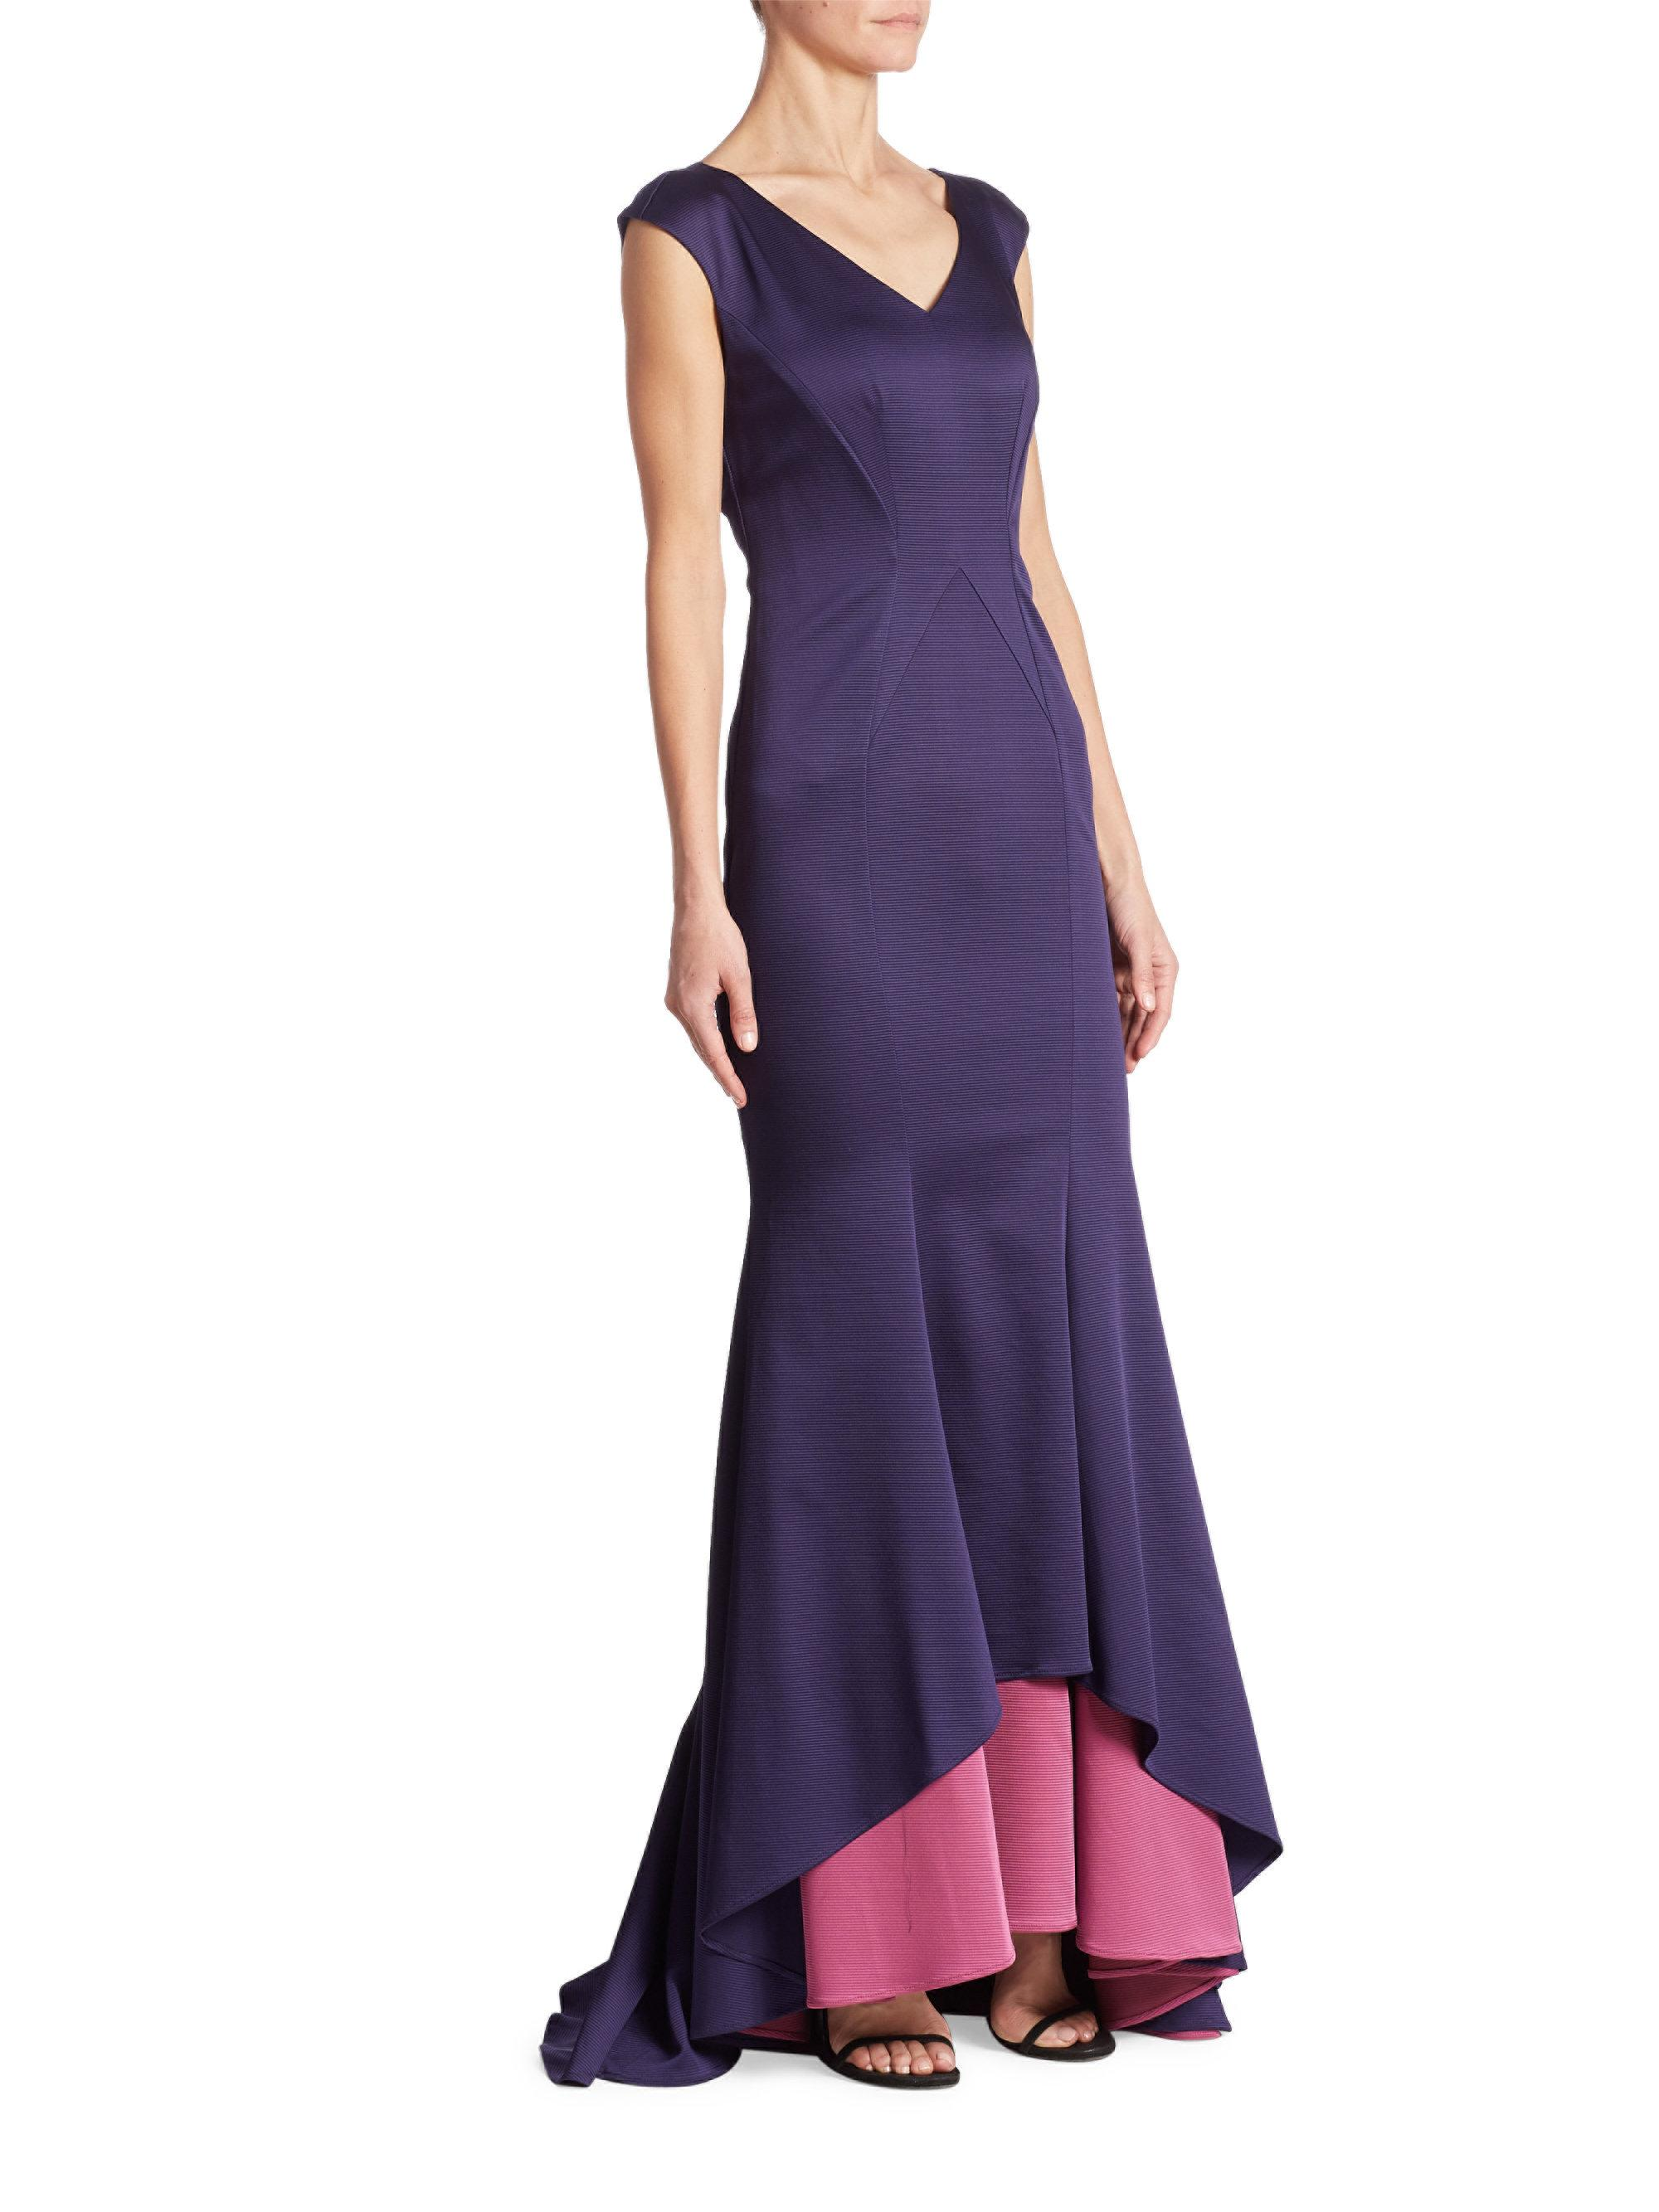 Zac Zac Posen Harmony Mermaid Gown in Purple - Lyst